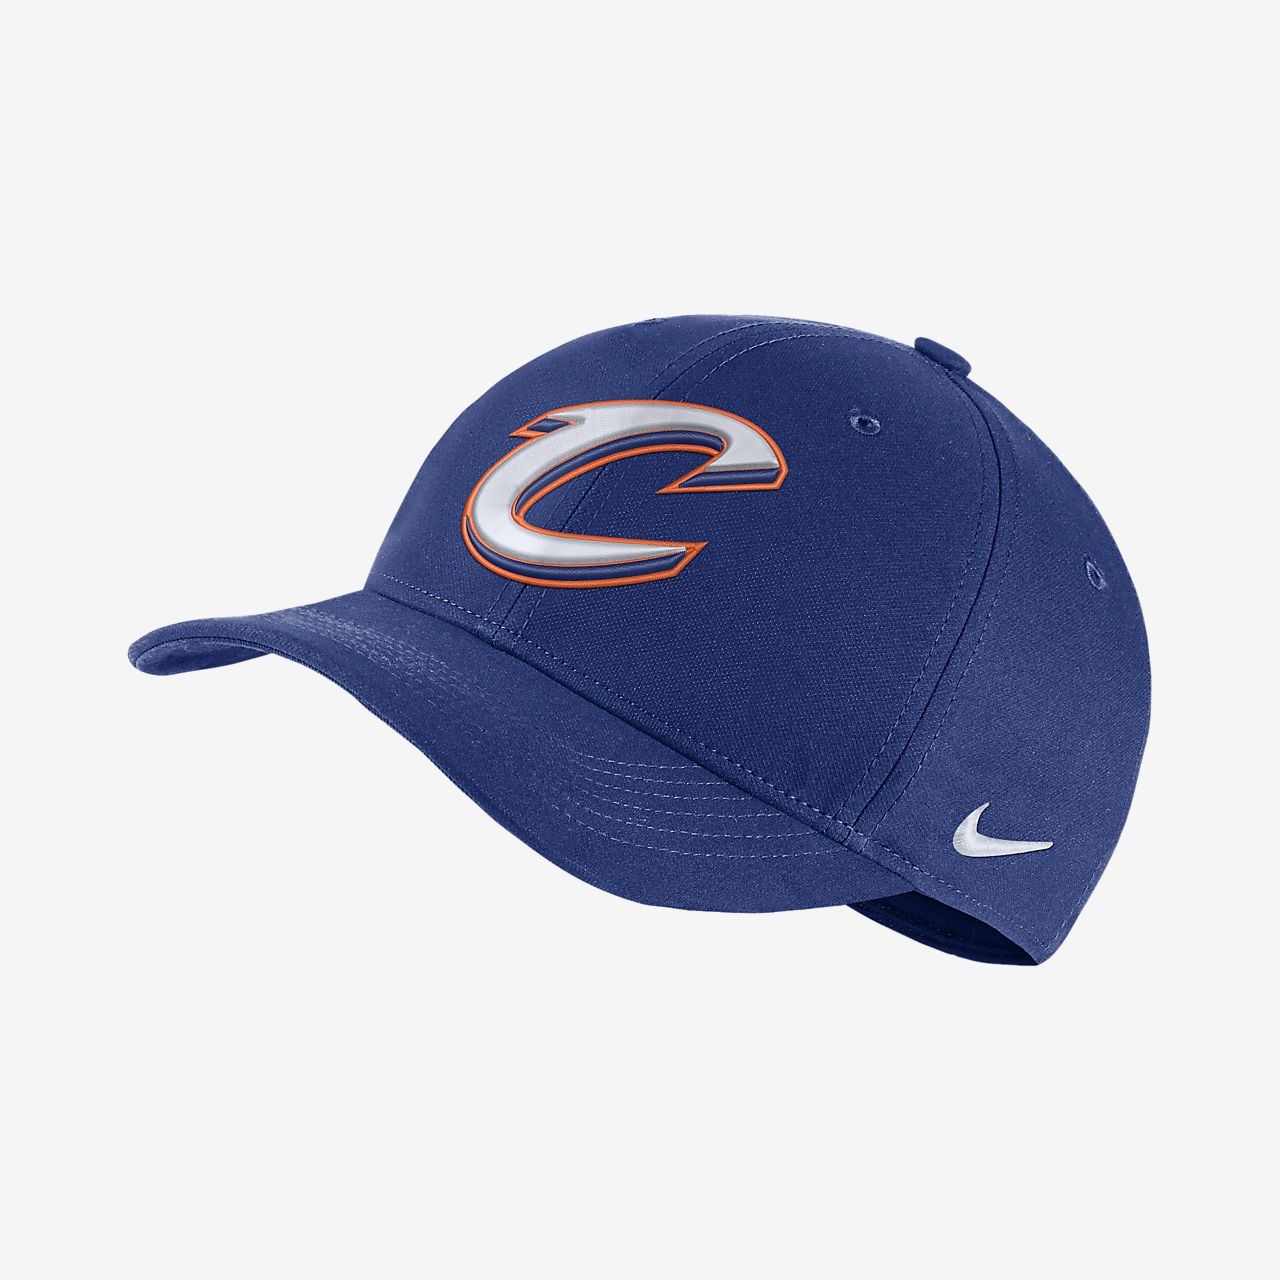 Cleveland Cavaliers City Edition Nike AeroBill Classic99 NBA 帽款